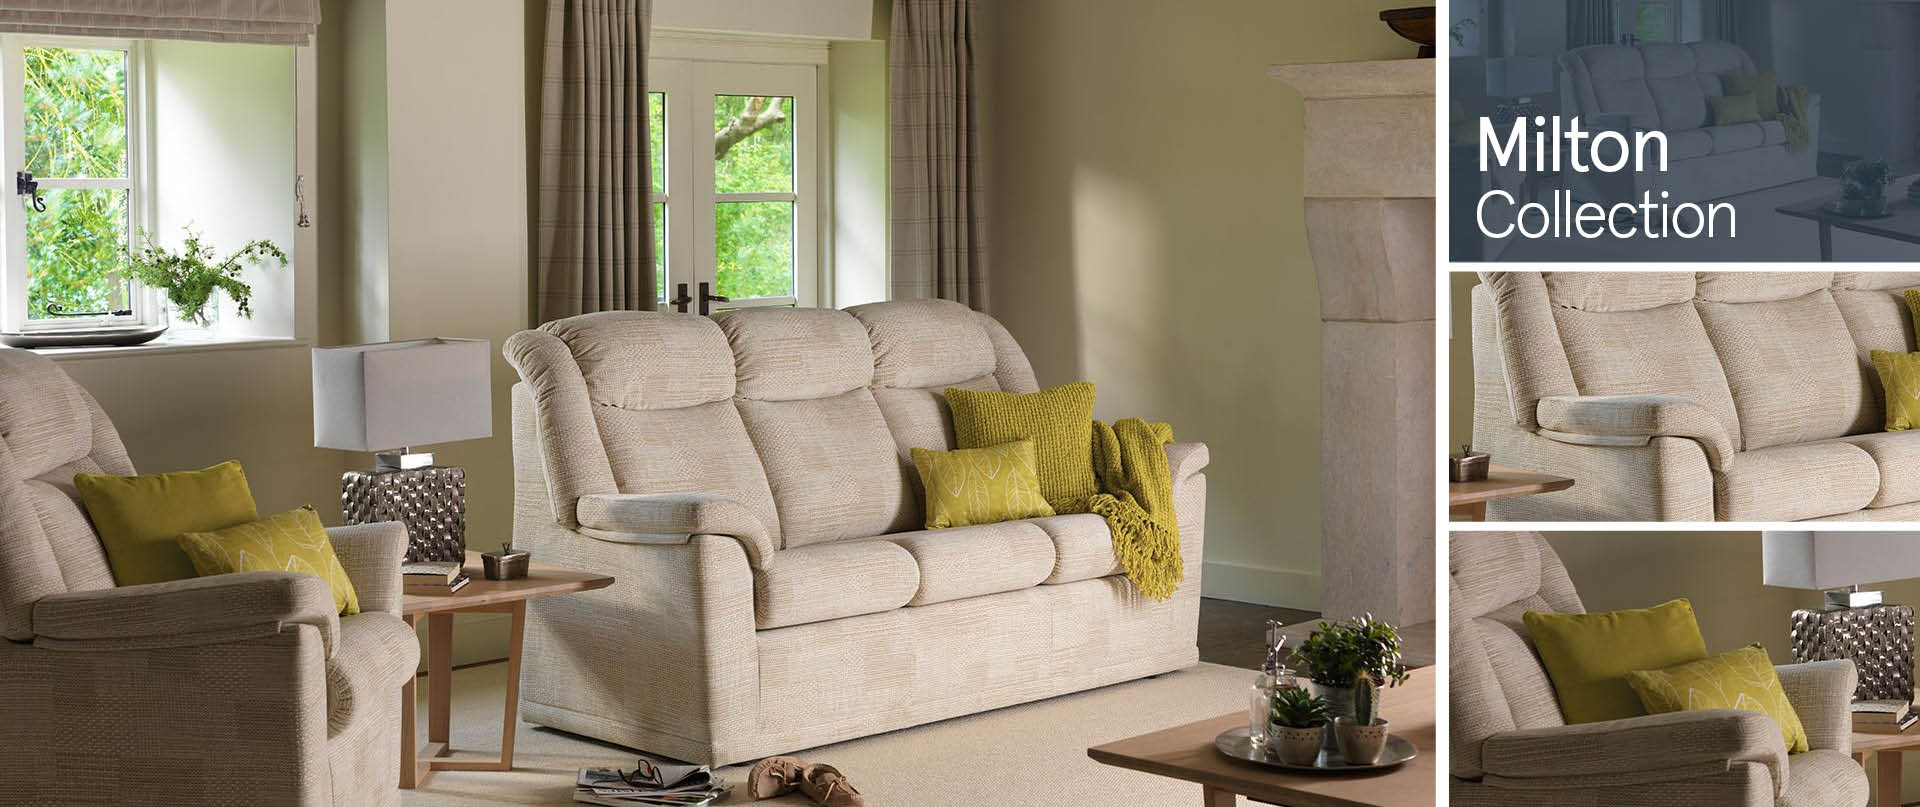 Milton All Fabric Sofa Ranges